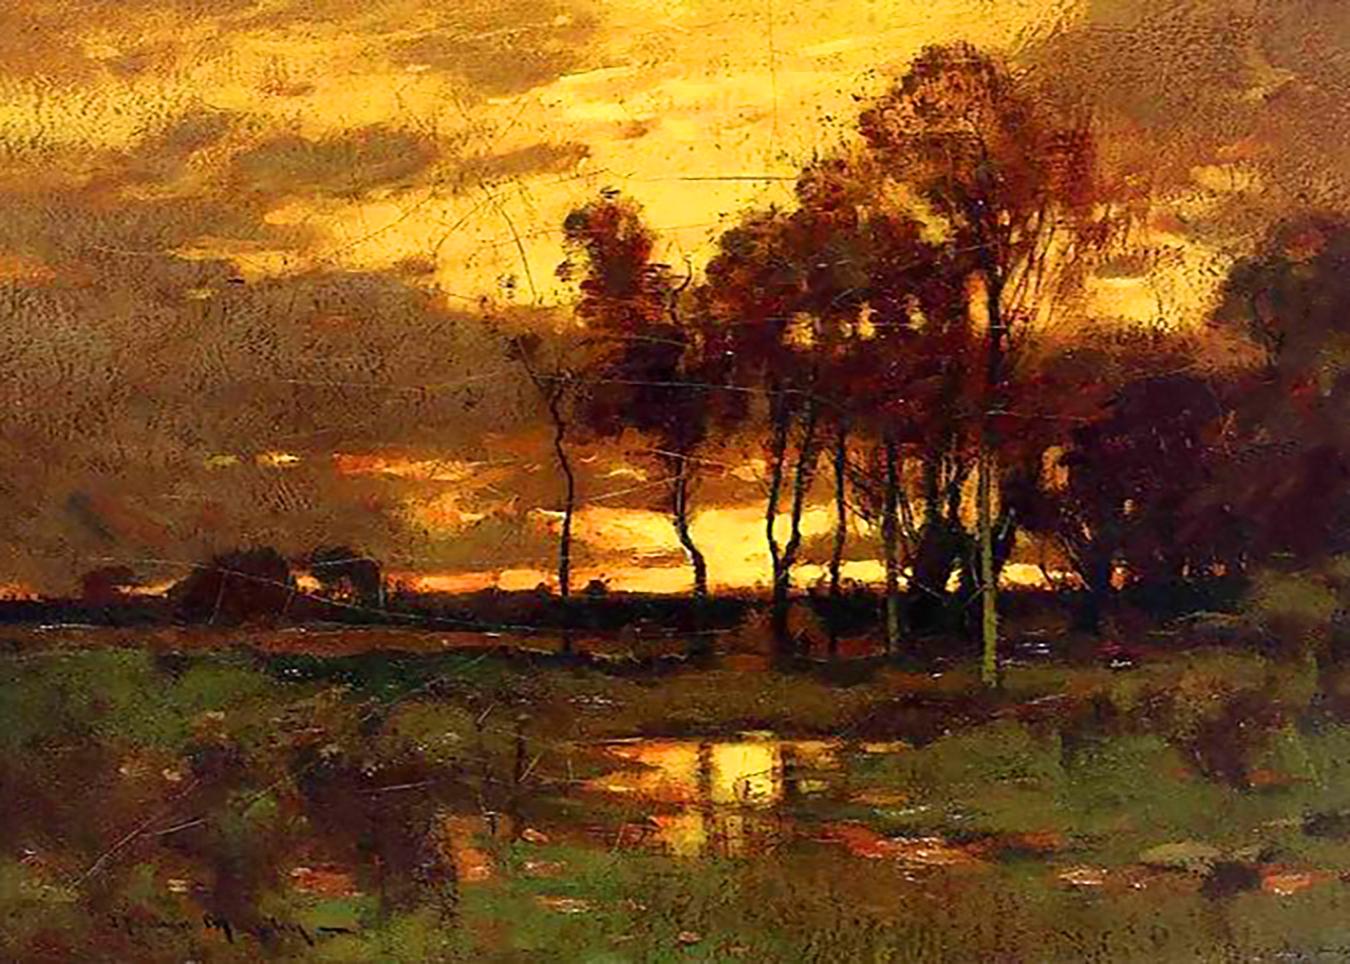 John Francis Murphy Sunset Landscape (Original)